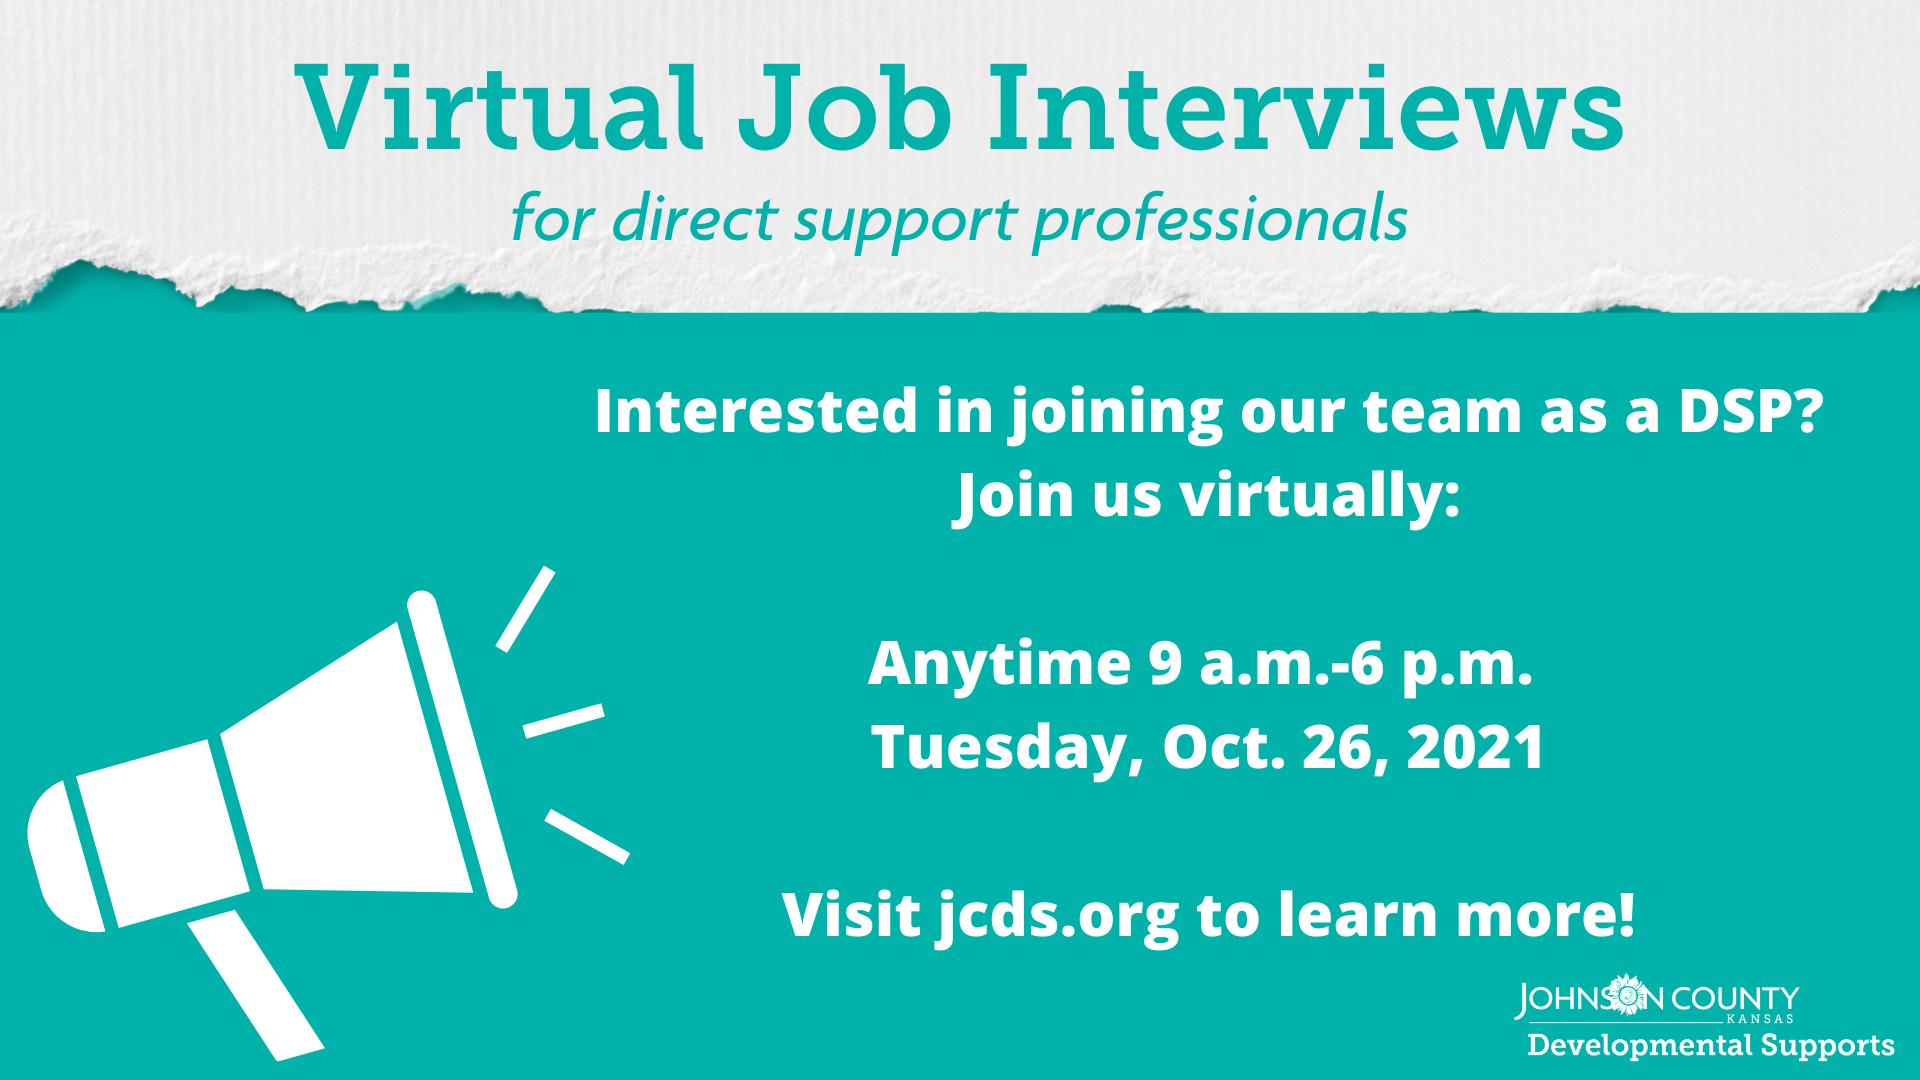 Featured Event: Johnson County Developmental Supports virtual job interviews